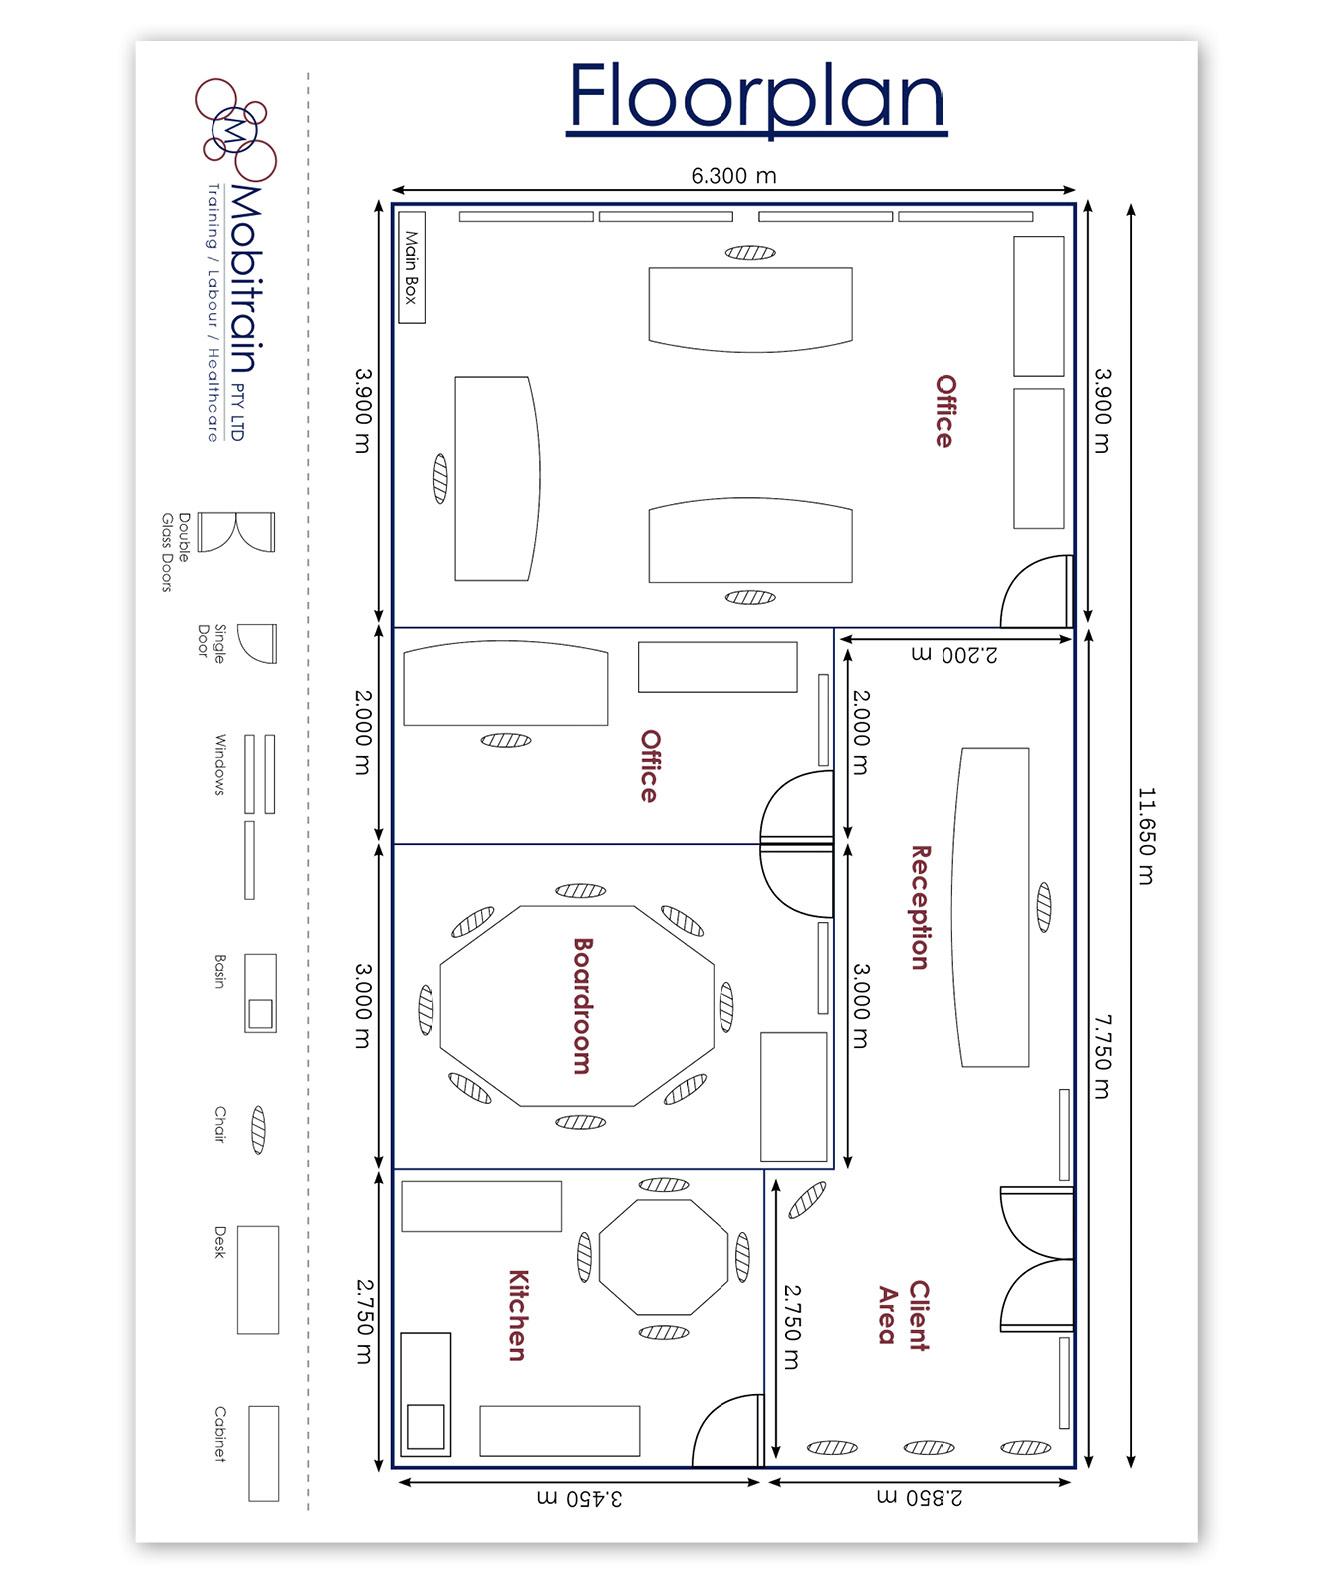 Mobitrain Floorplan